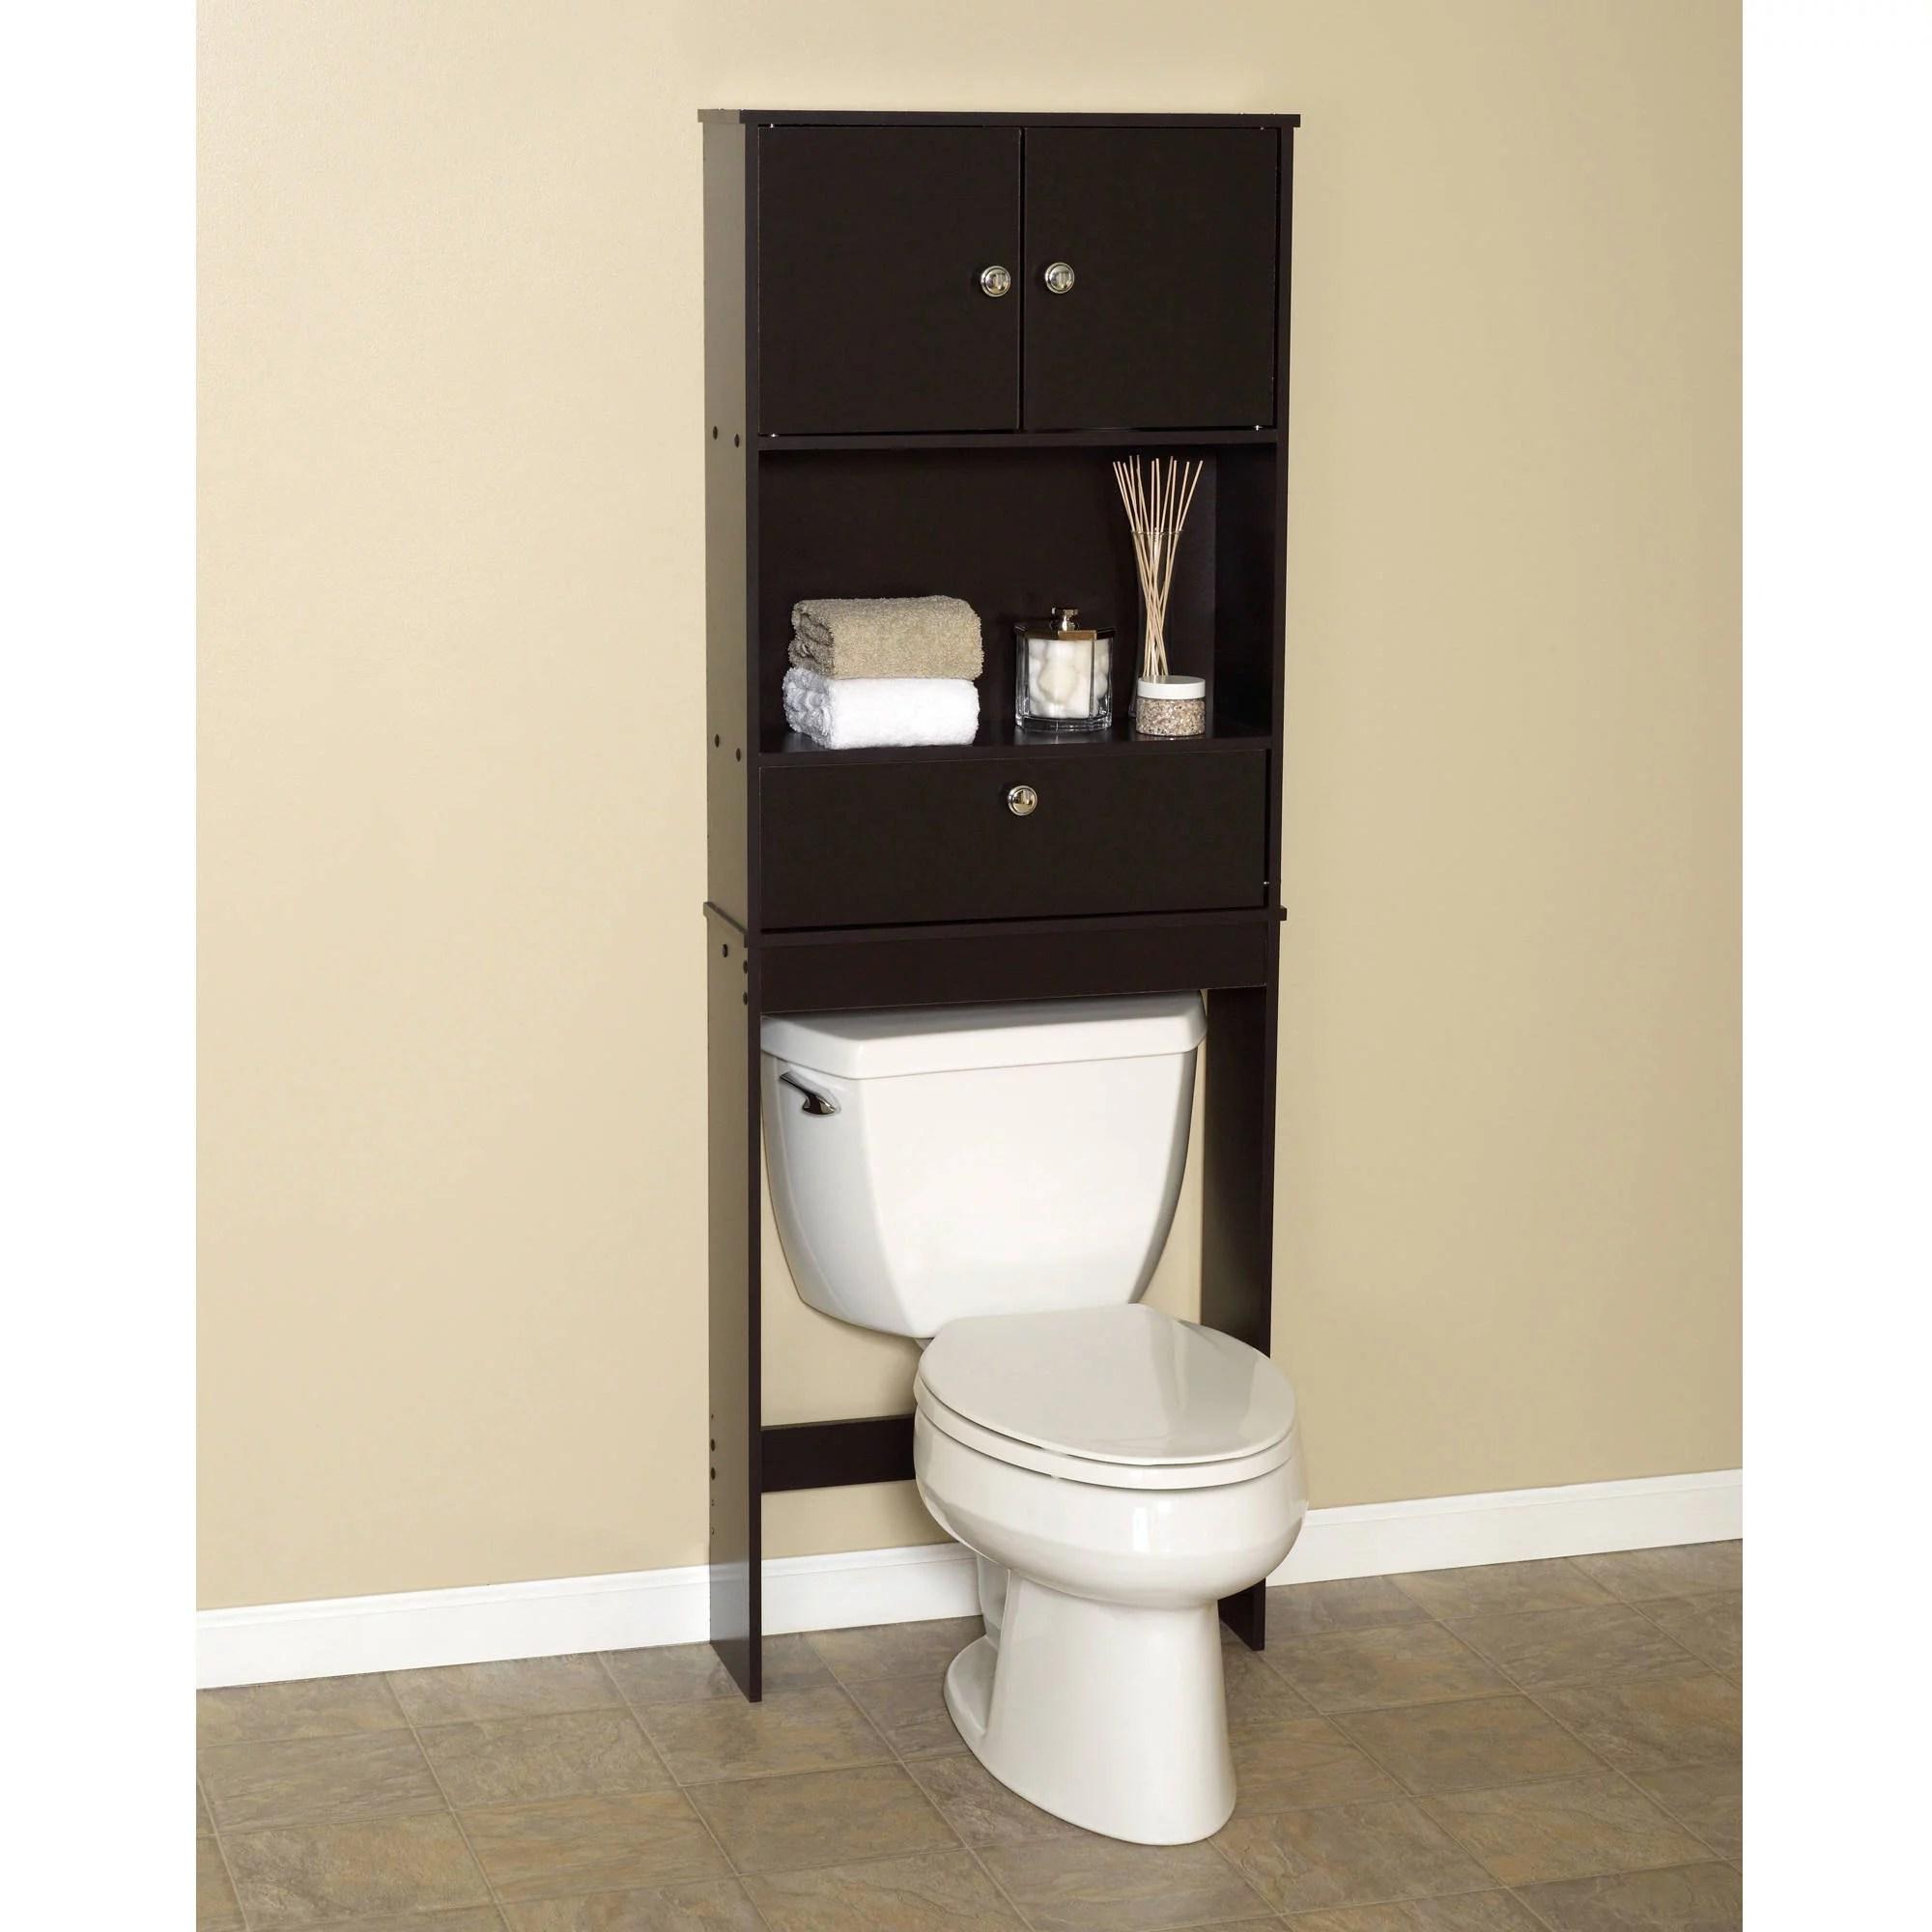 Over The Toilet Bath Storage Shelf Cabinet Space Saver Bathroom Organizer Brown 780414059374 Ebay